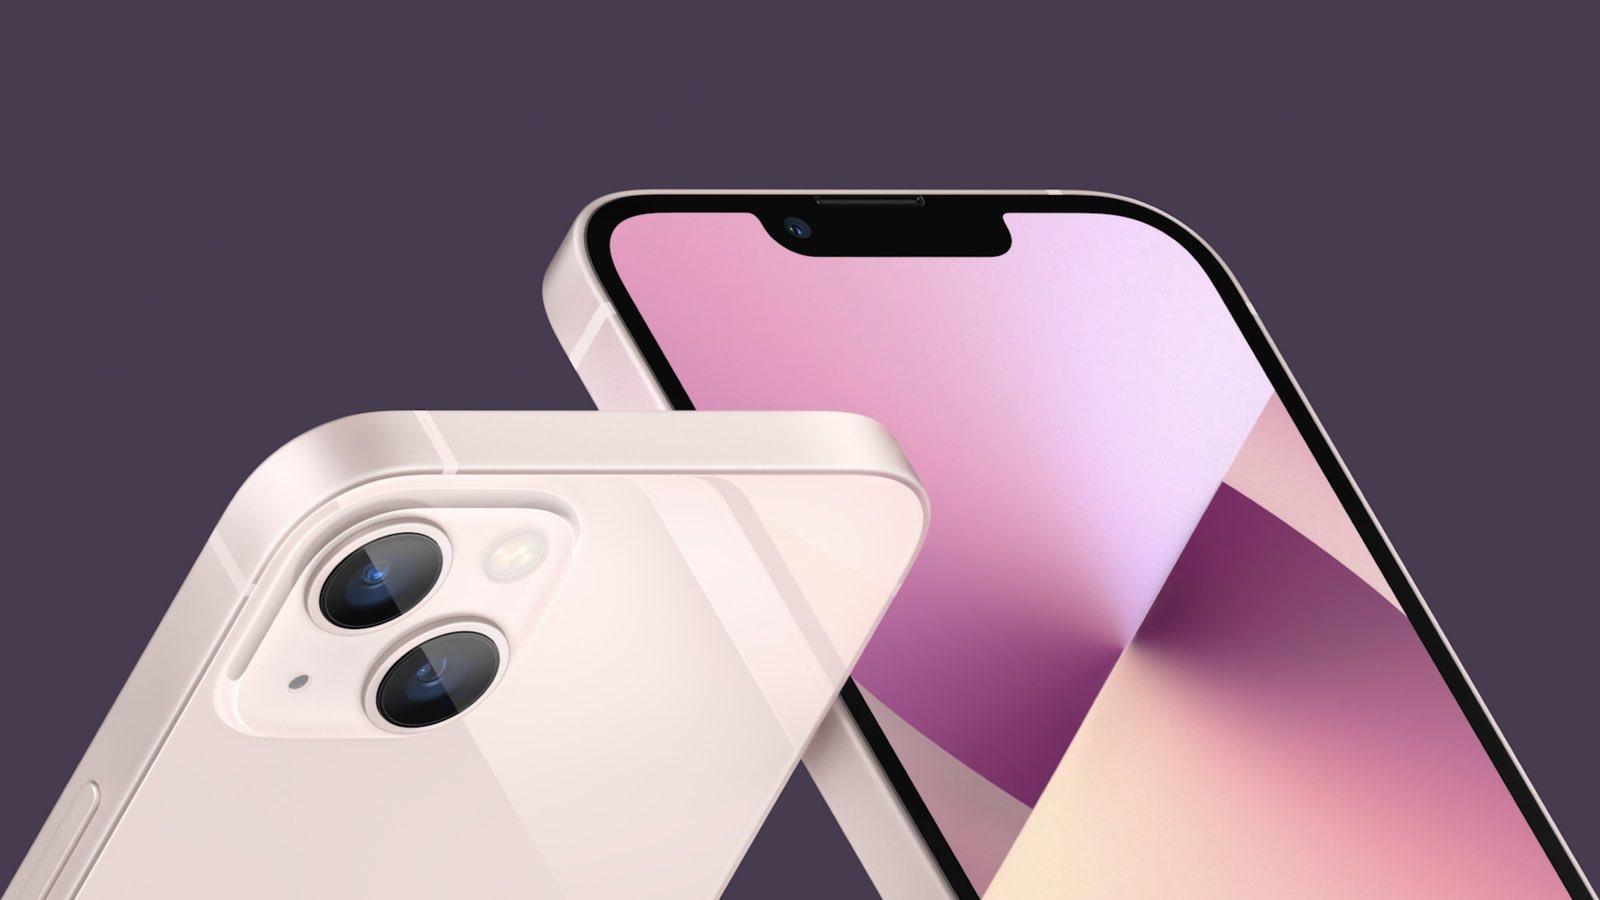 iPhone 13 সিরিজের দাম : iPhone 13 Mini: ৬৯,৯০০ টাকা। iPhone 13: ৭৯,৯০০ টাকা। iPhone 13 Pro: ১,১৯,৯০০ টাকা। iPhone 13 Pro Max: ১,২৯,৯০০ টাকা। ছবি : অ্যাপেল (Apple)